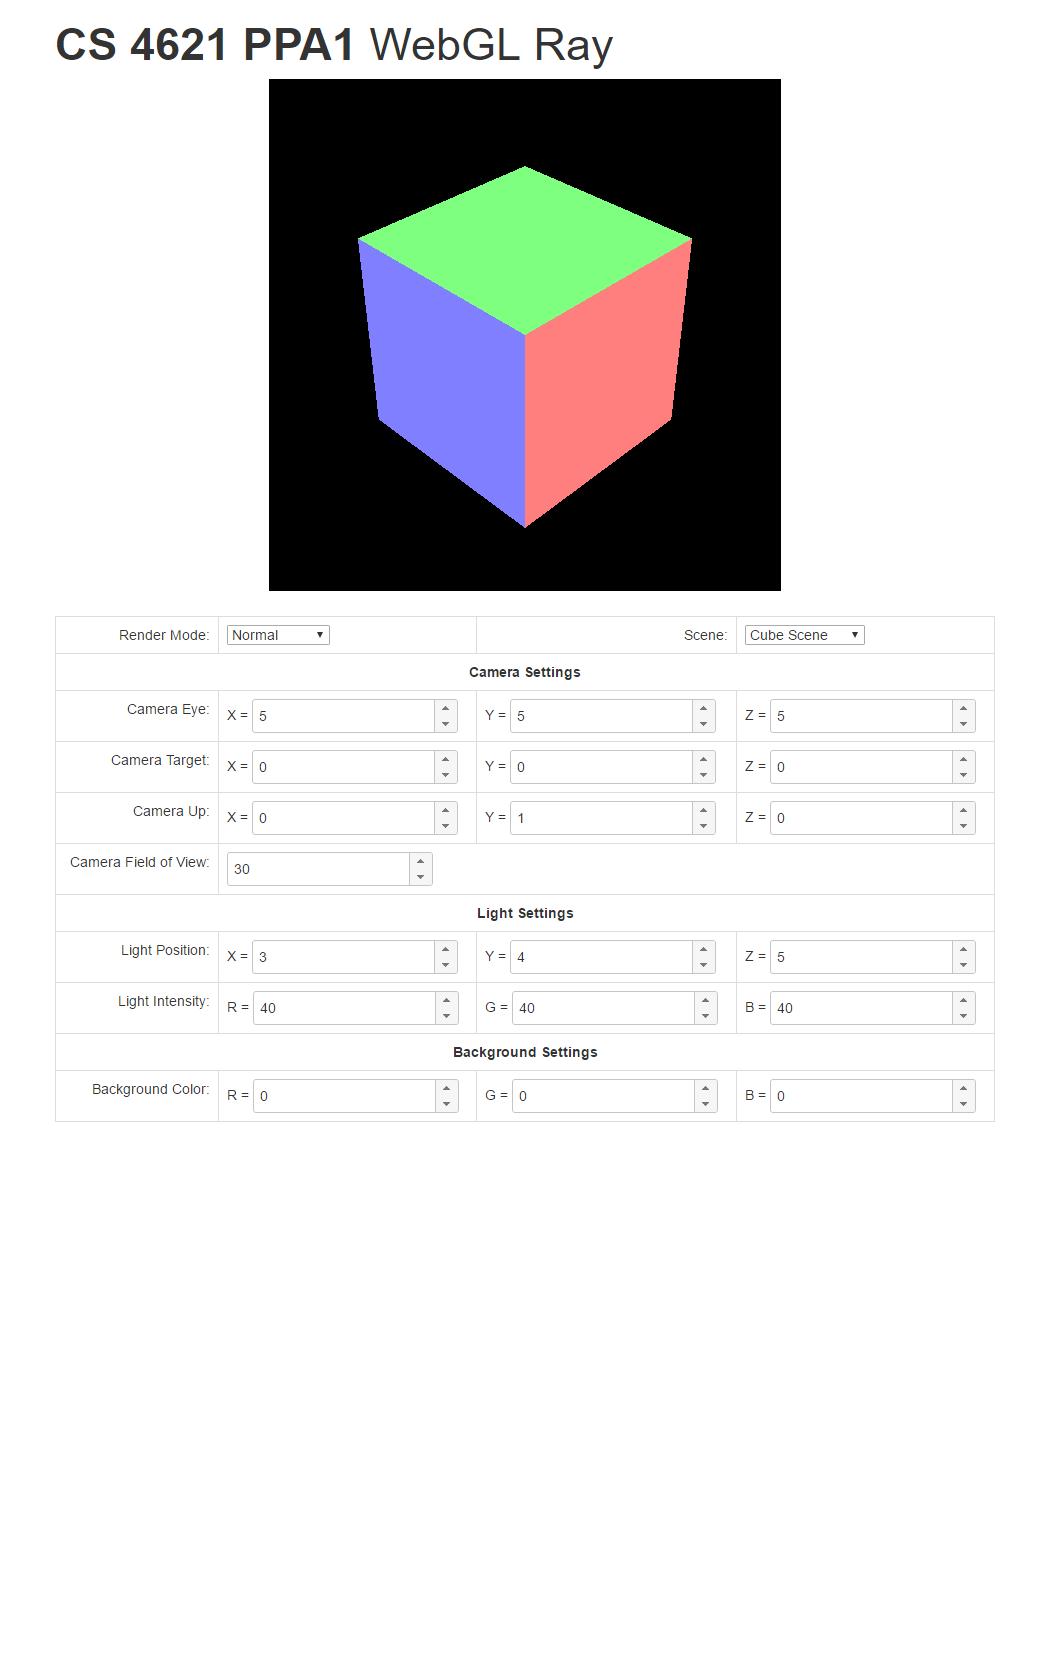 CS 4621: PPA1 -- WebGL Ray